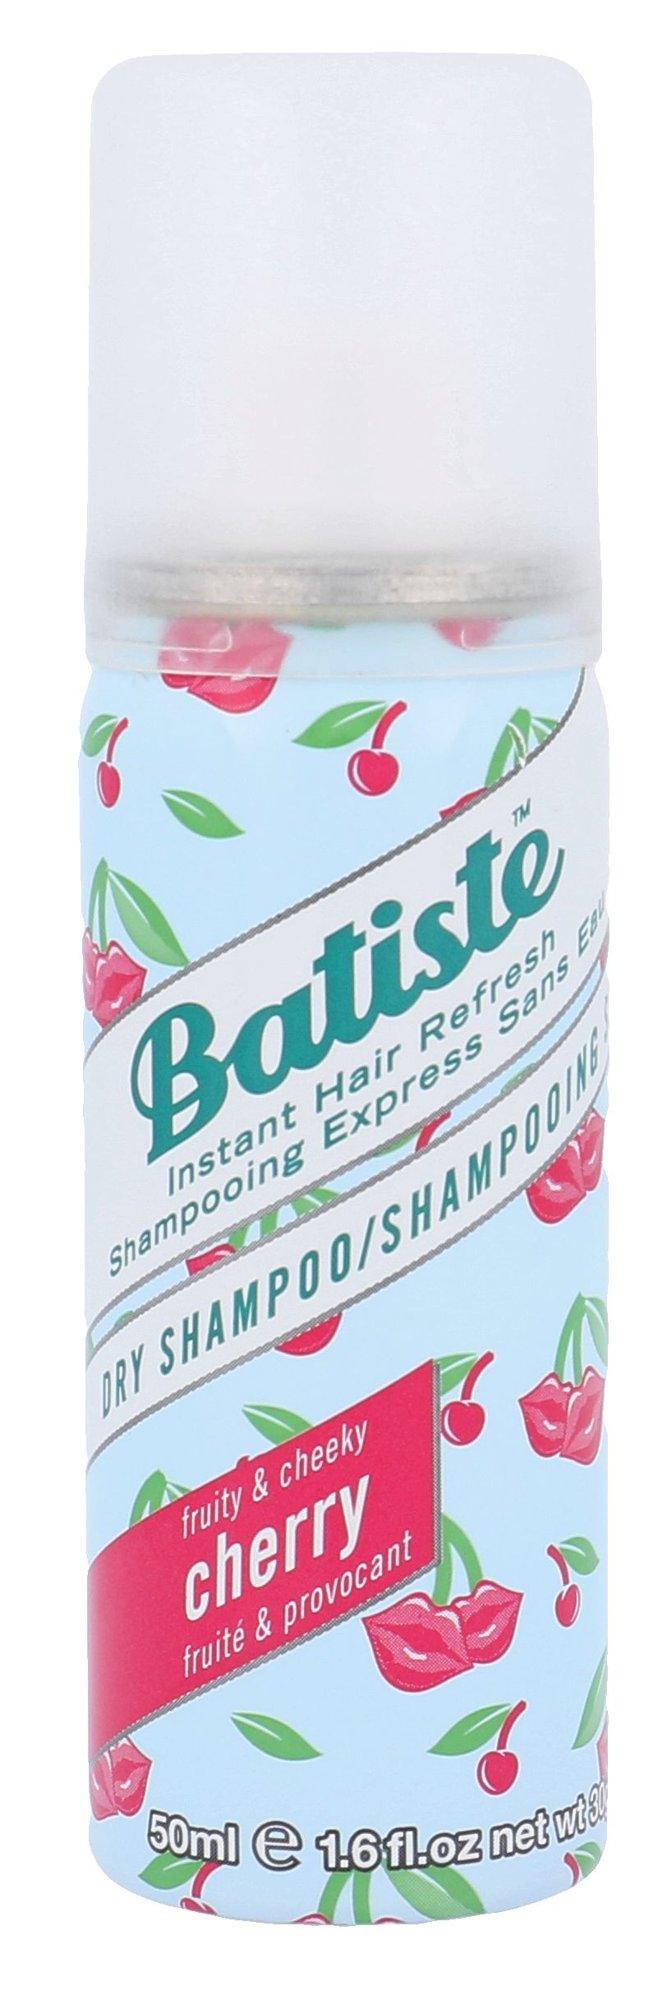 Batiste Cherry Dry Shampoo 50ml